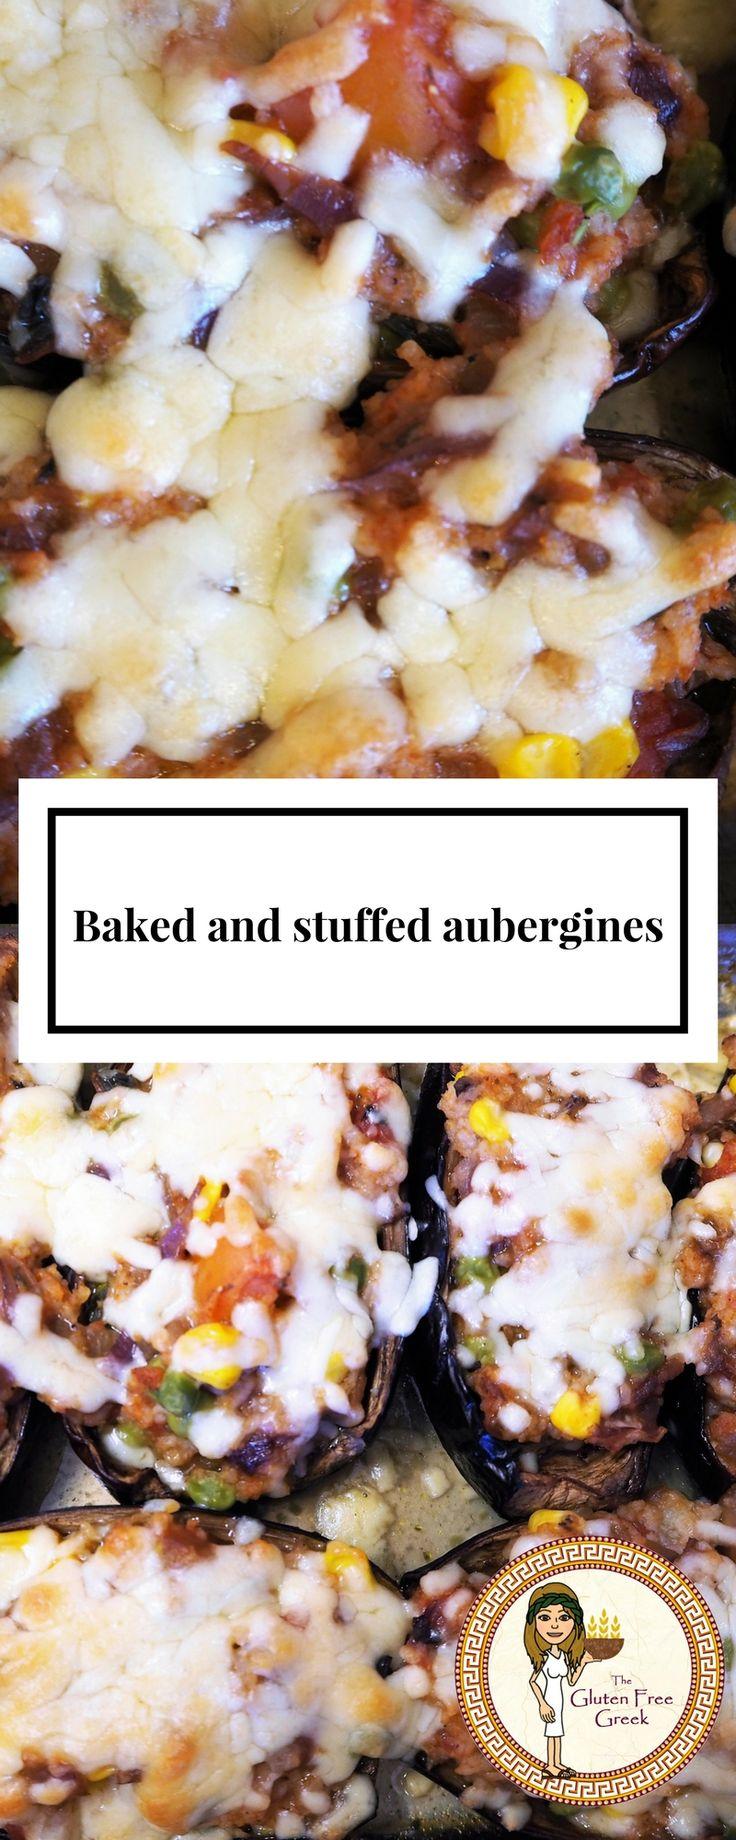 Baked and stuffed aubergines Vegetarian